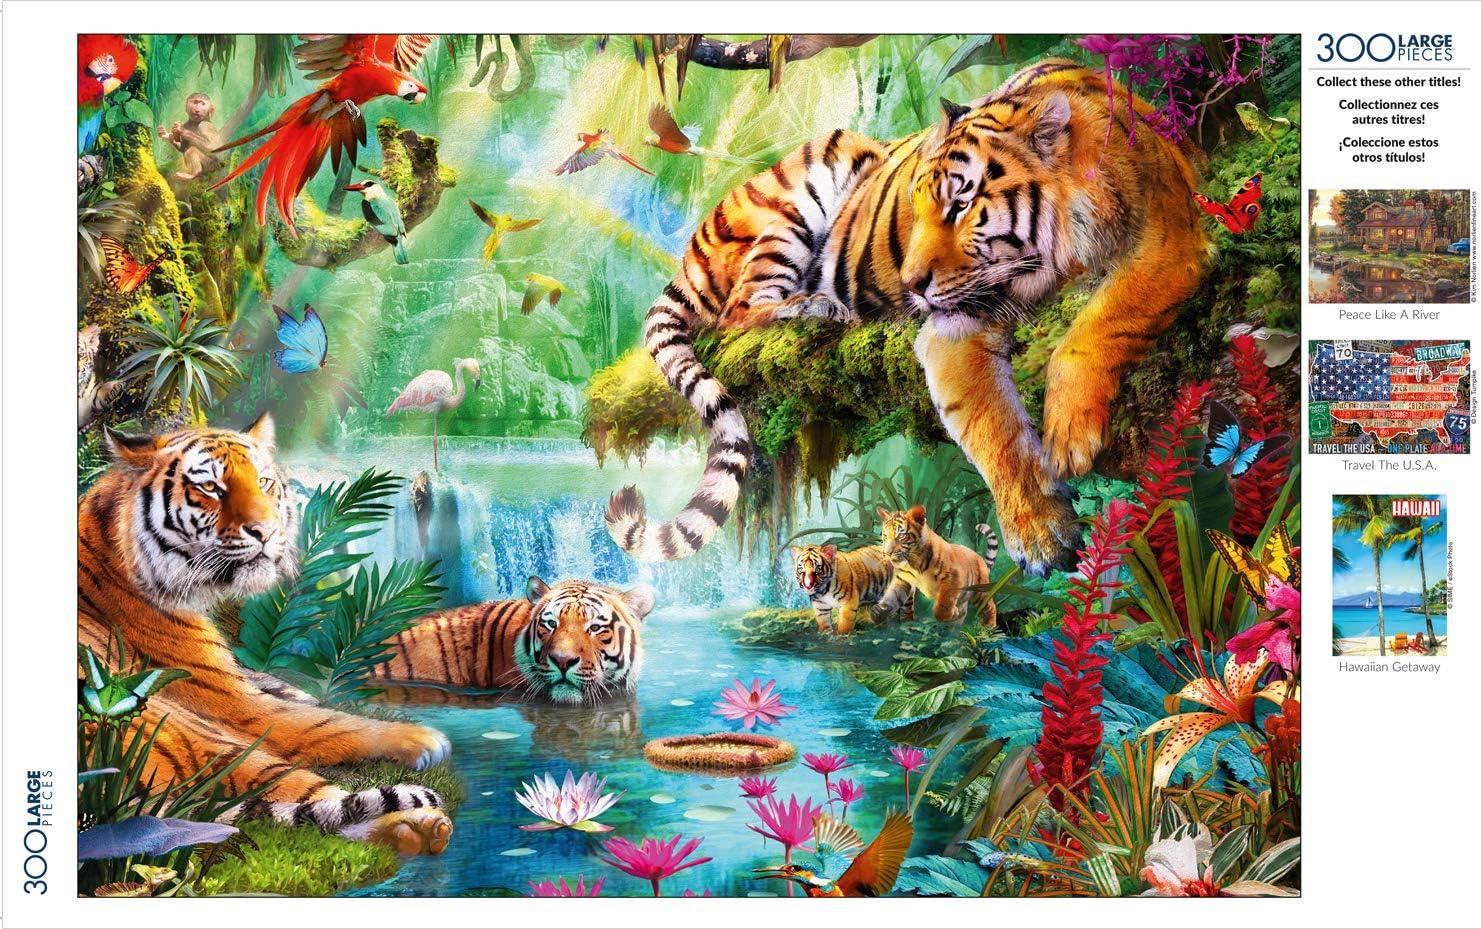 Buffalo Games 300 Large Piece Jigsaw Puzzle Tiger Lagoon